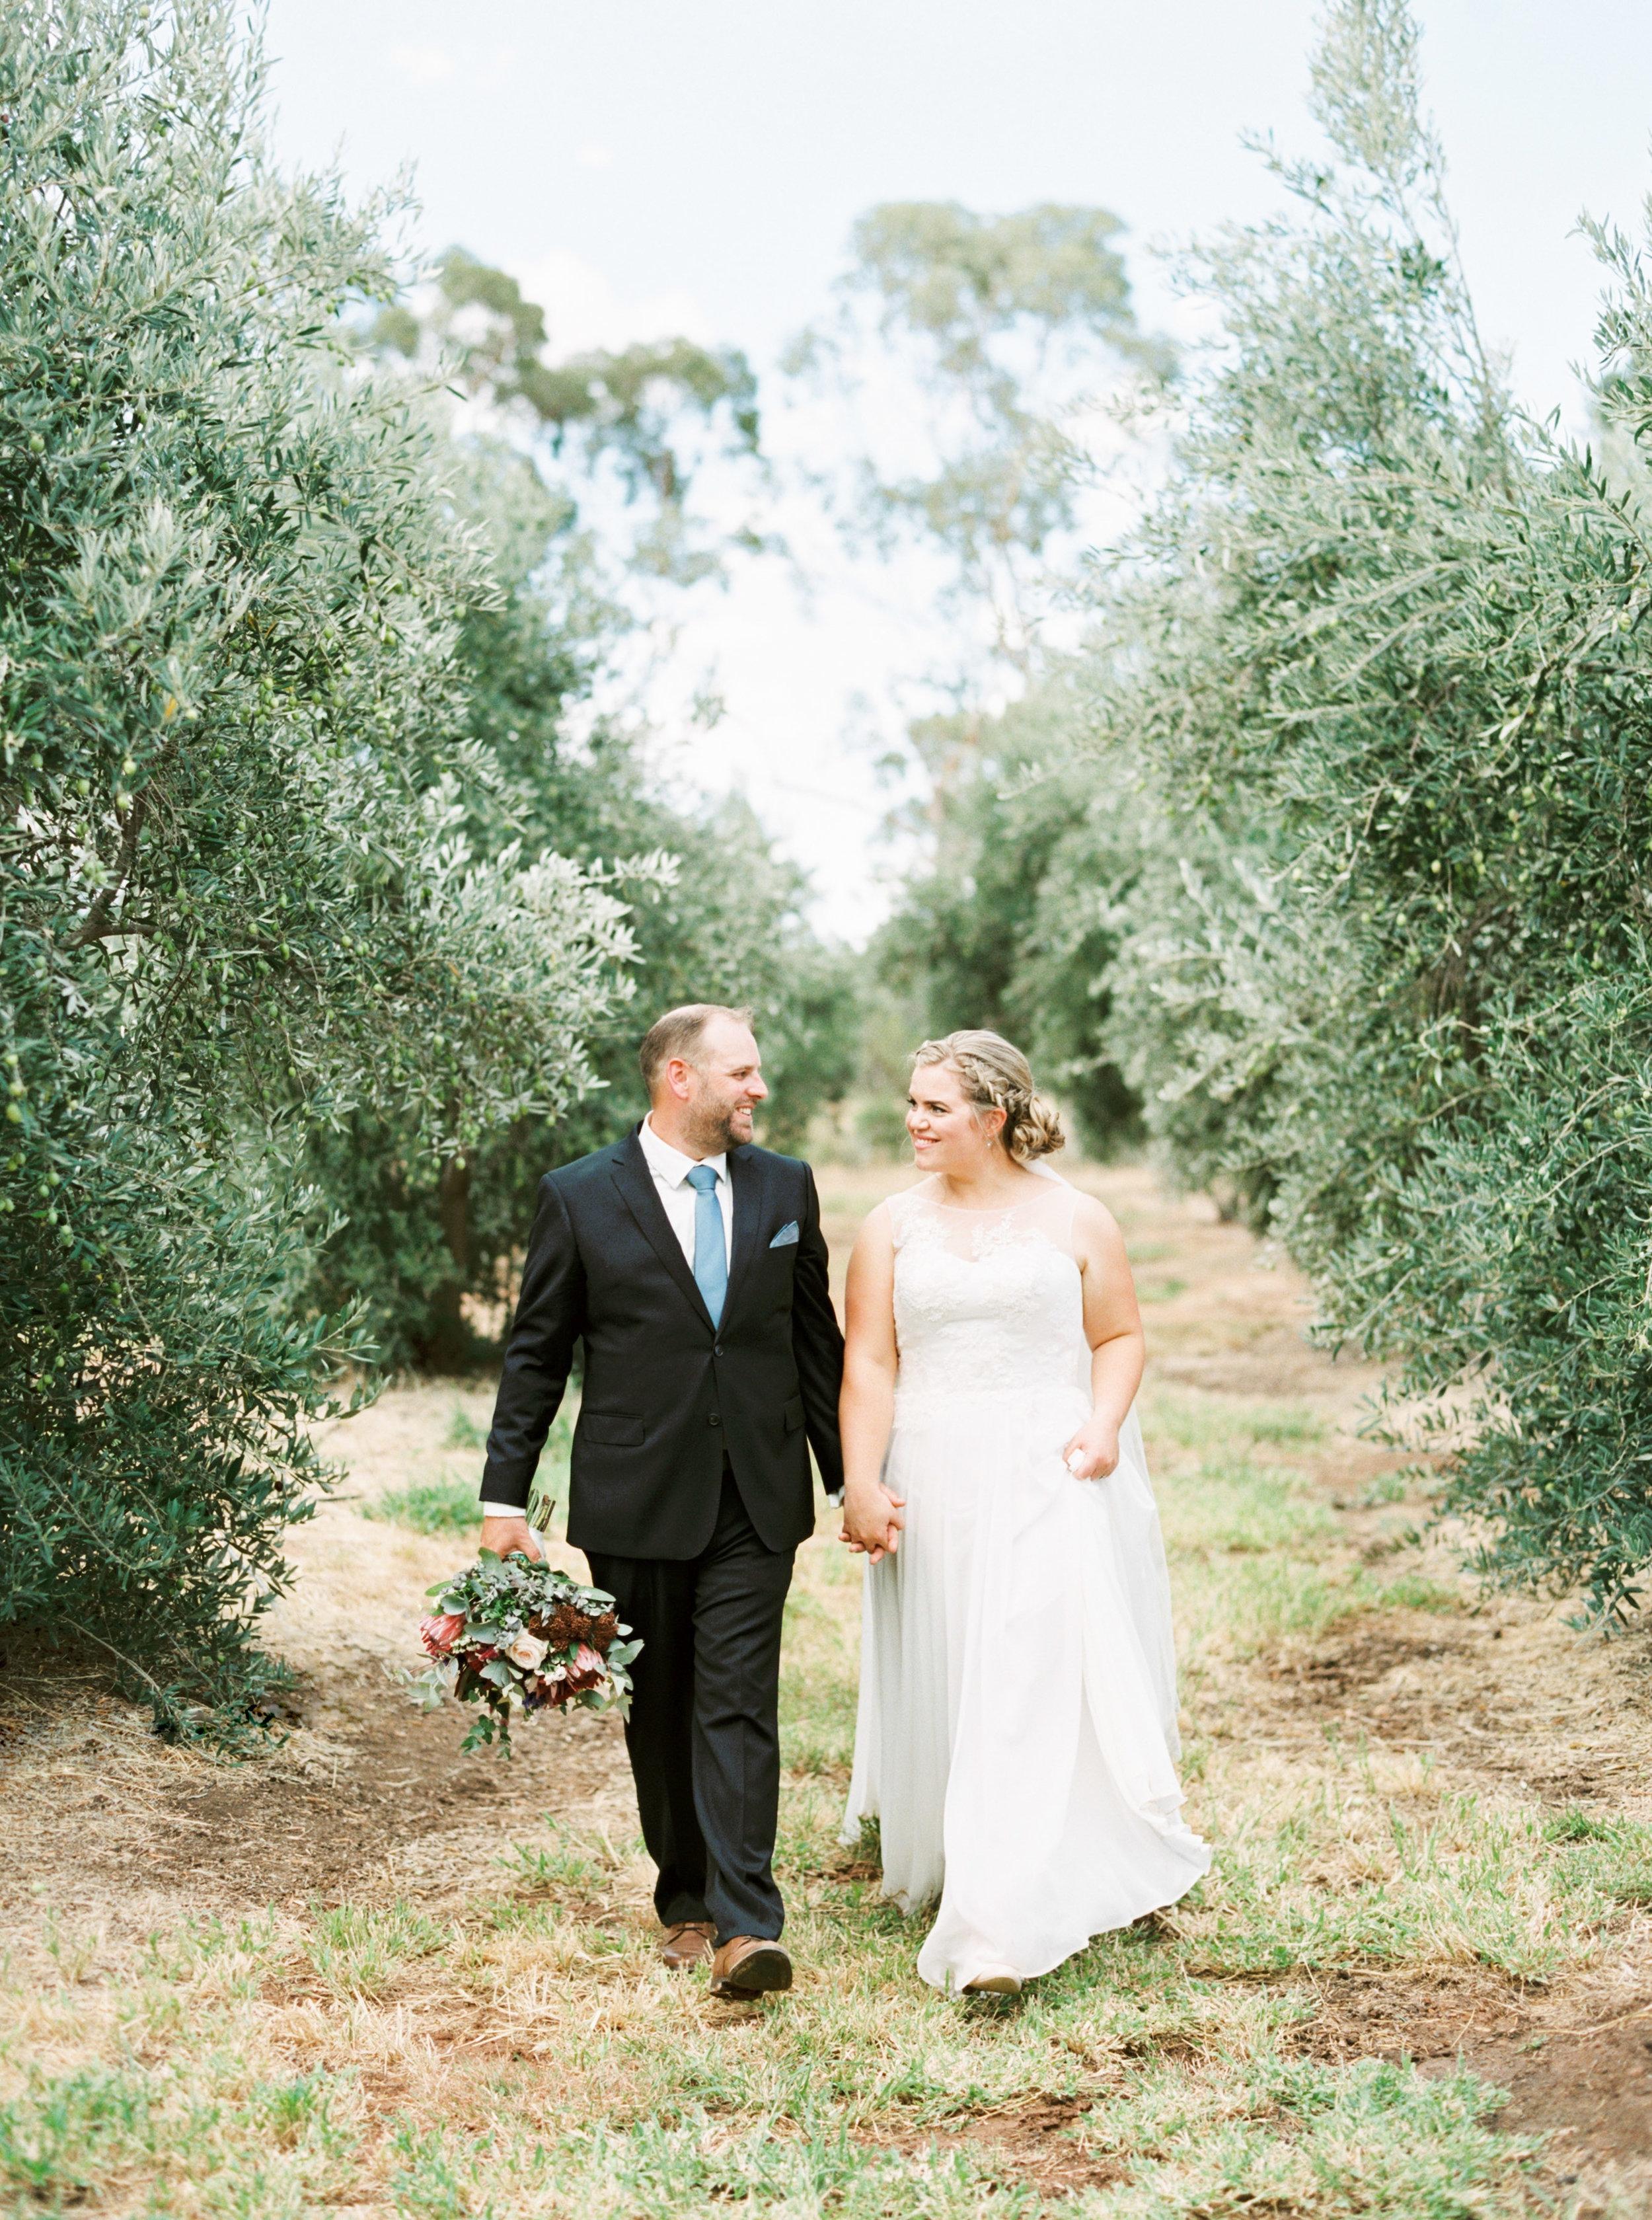 00035- Fine Art Film NSW Mudgee Wedding Photographer Sheri McMahon.jpg